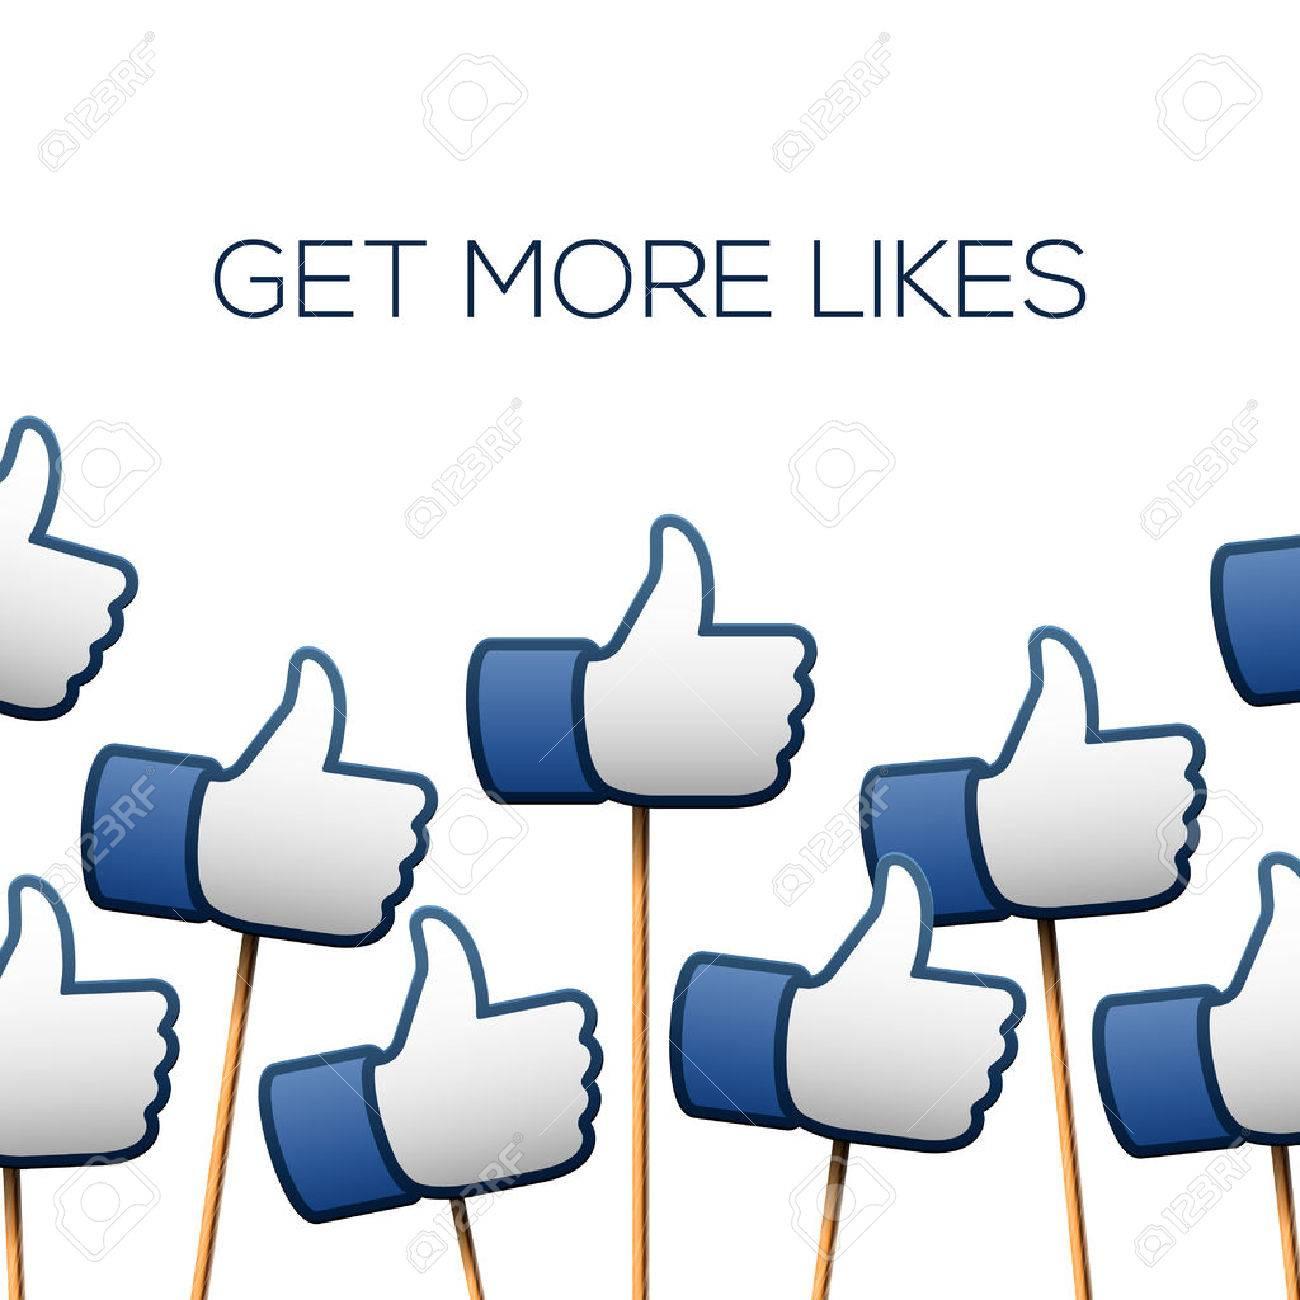 Like thumbs up symbols. Get more likes, vector illustration. Standard-Bild - 38732227